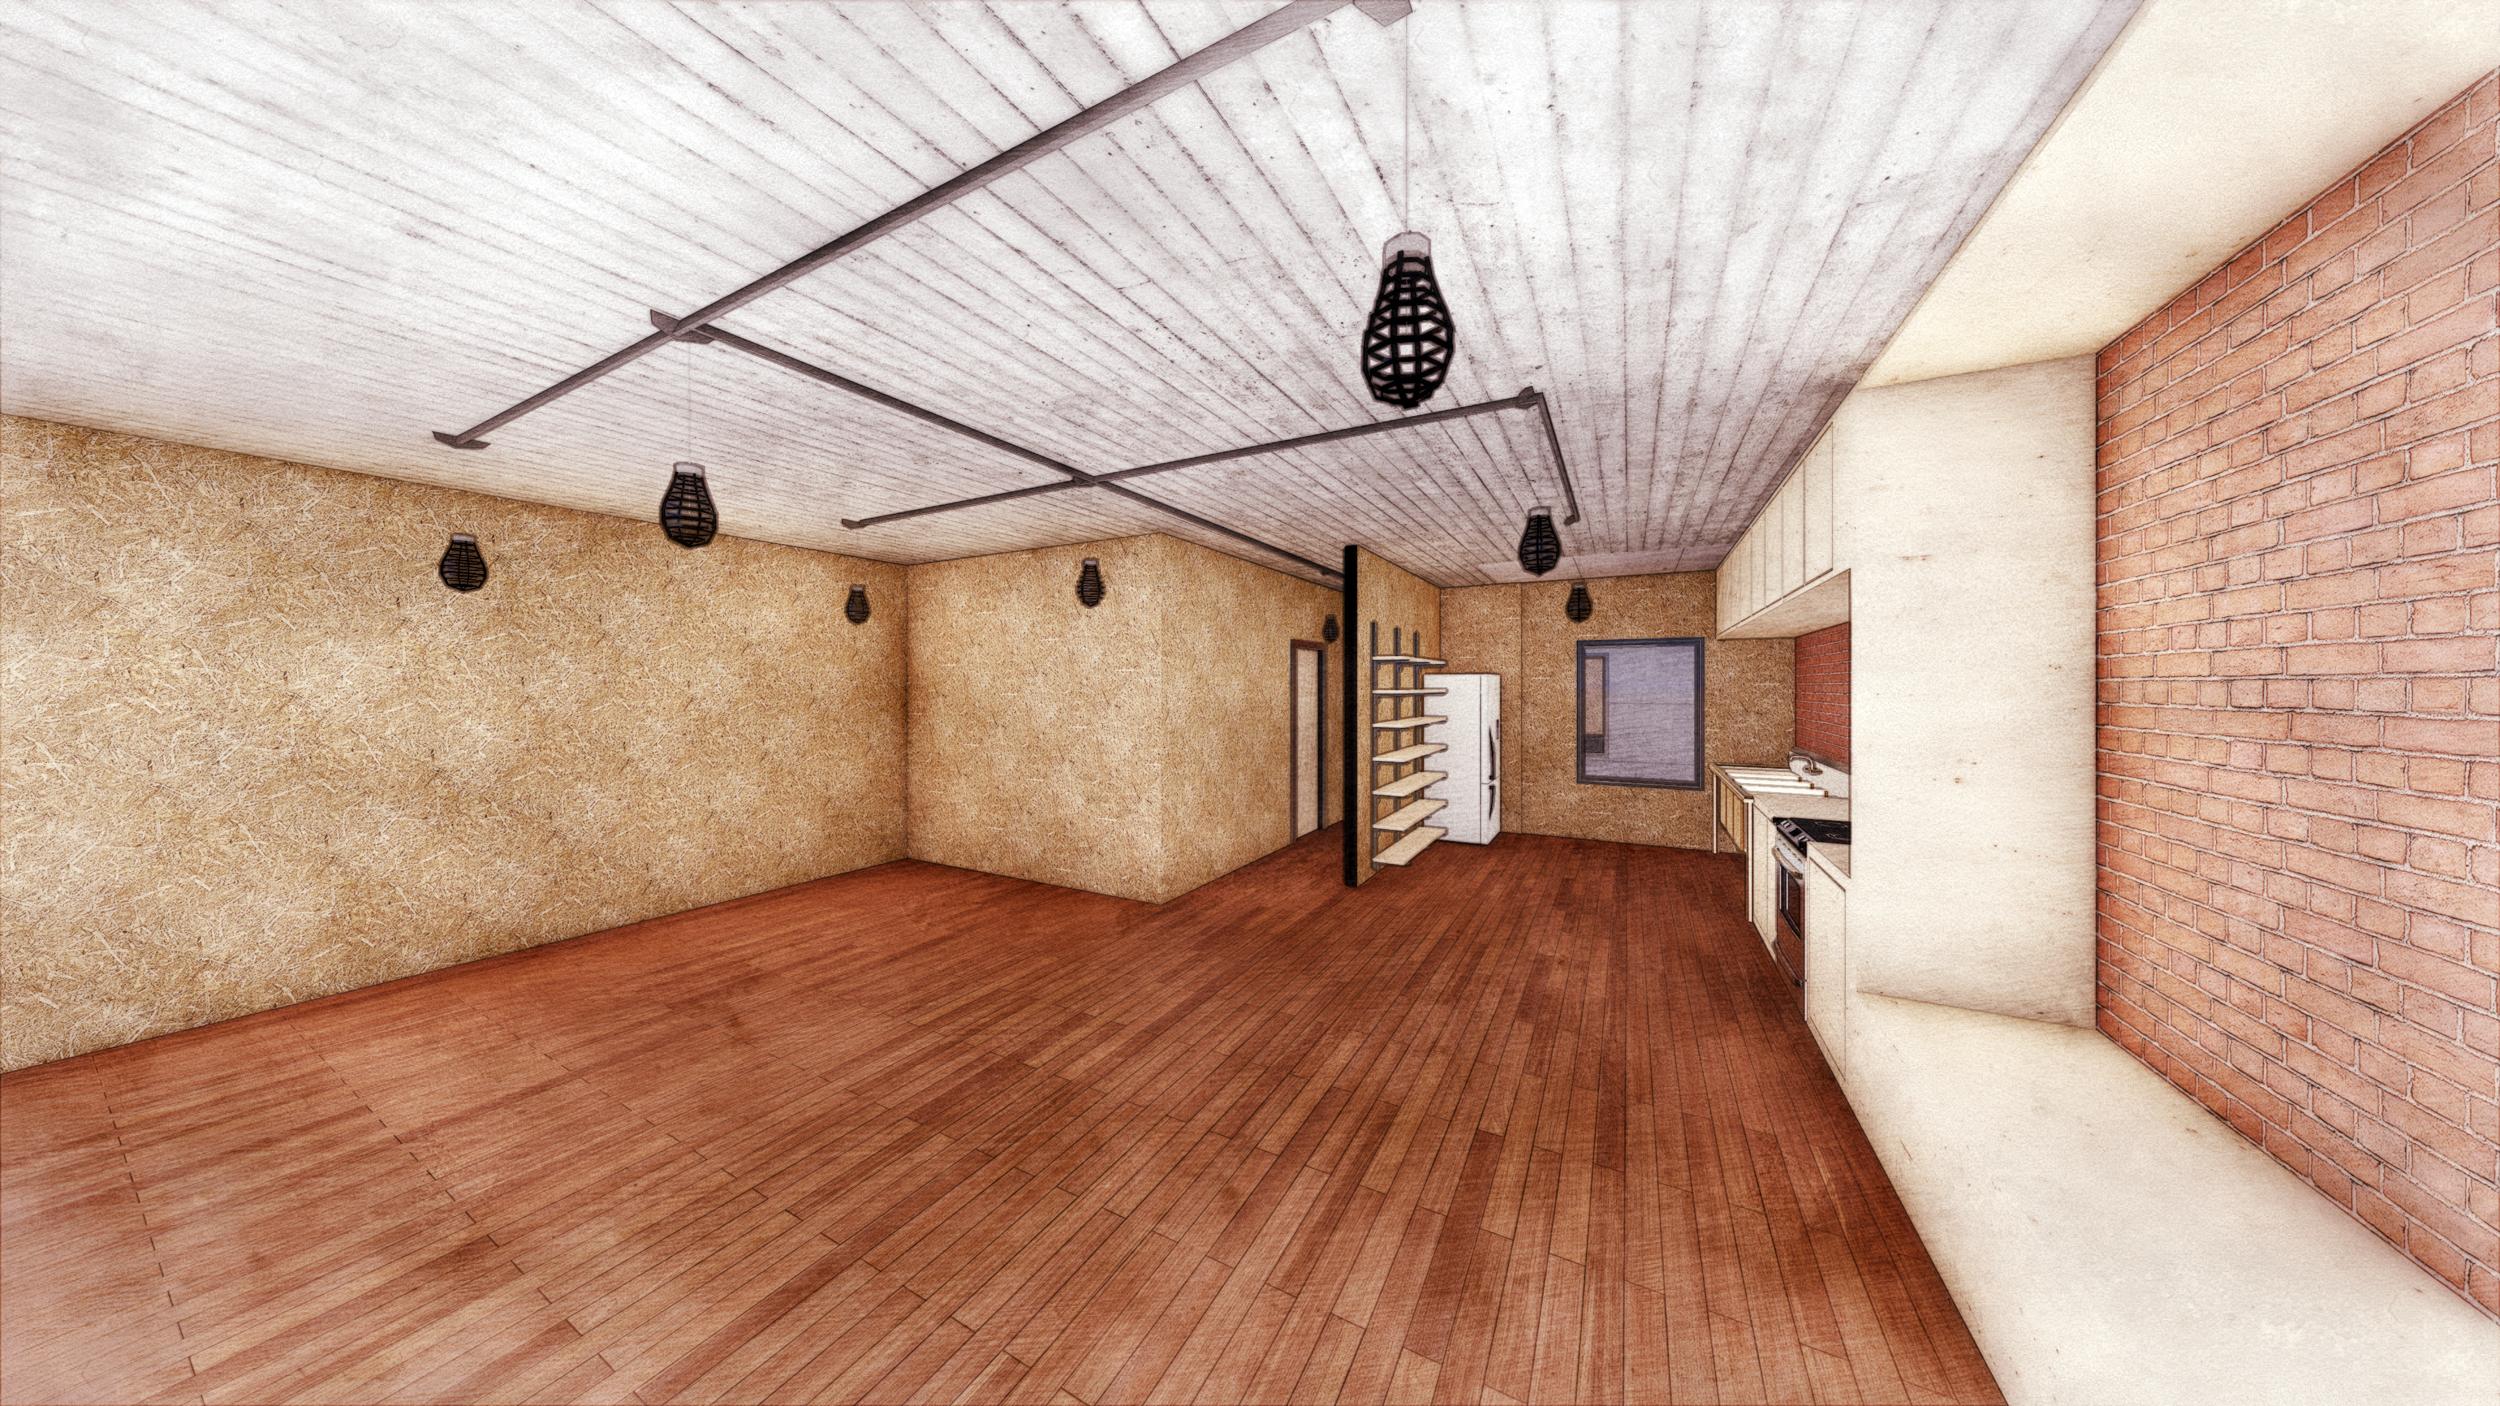 Apartment Internal View